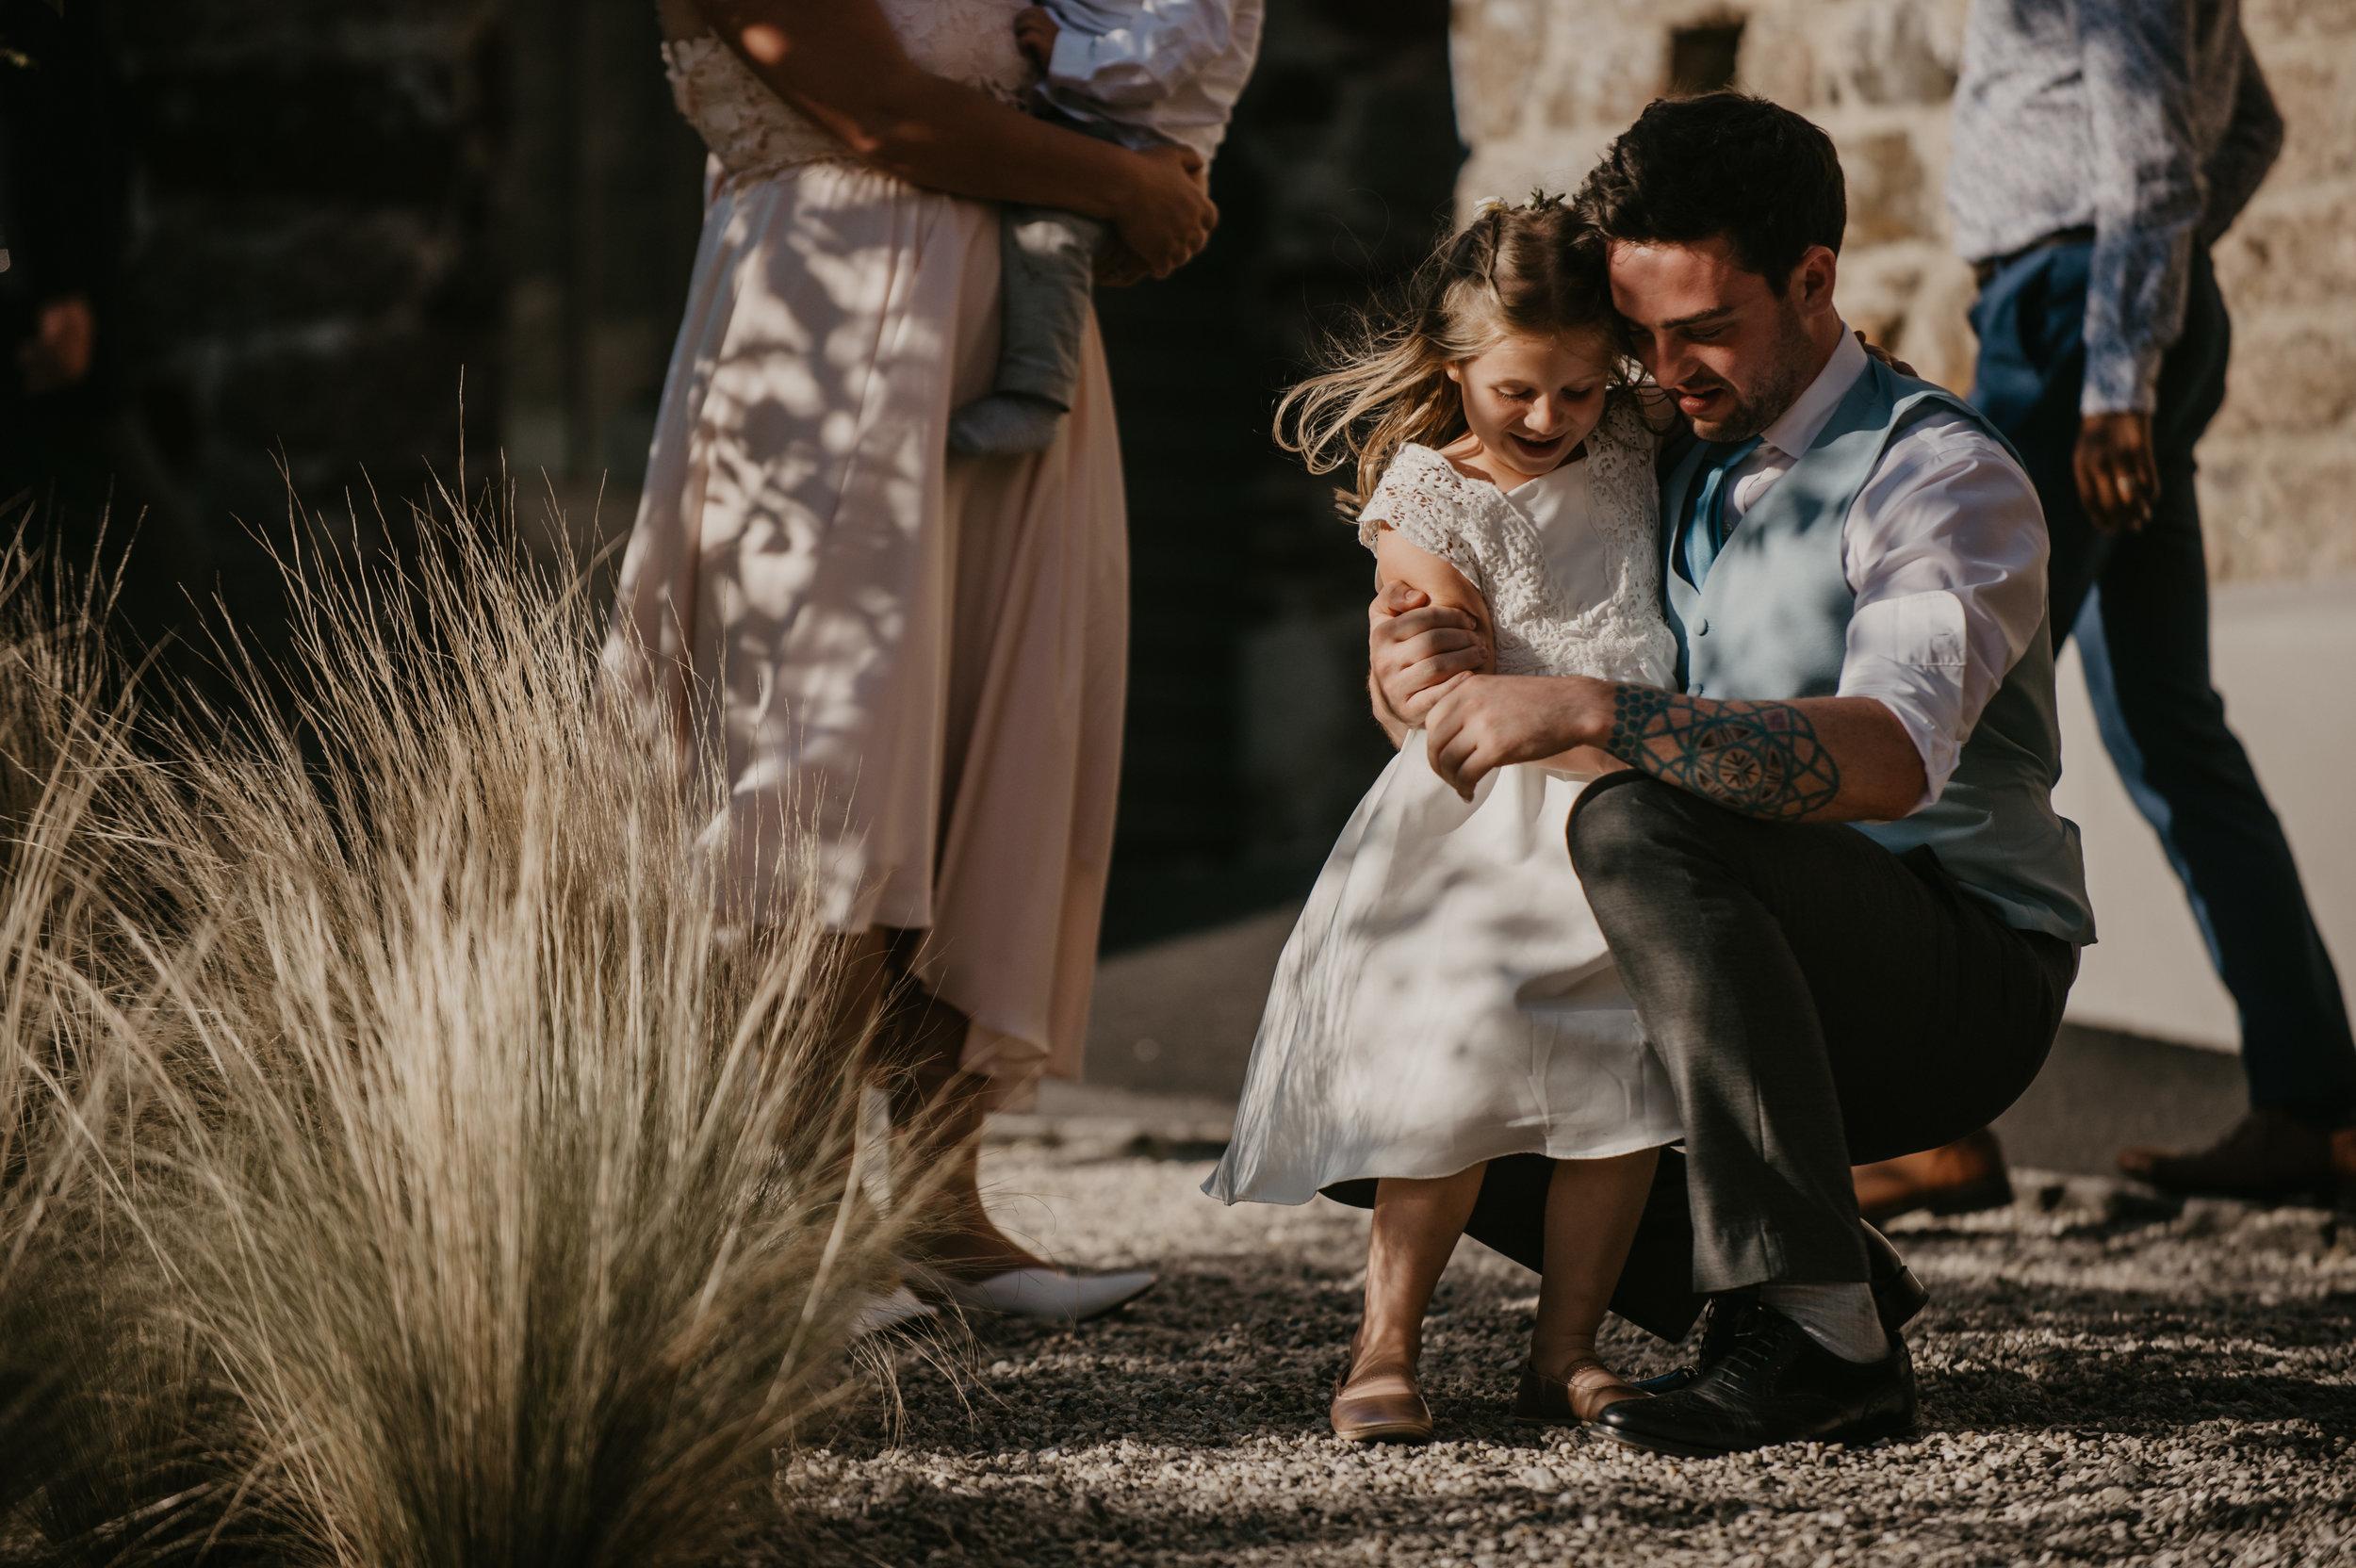 mark-shaw-photography-wedding-2.jpg